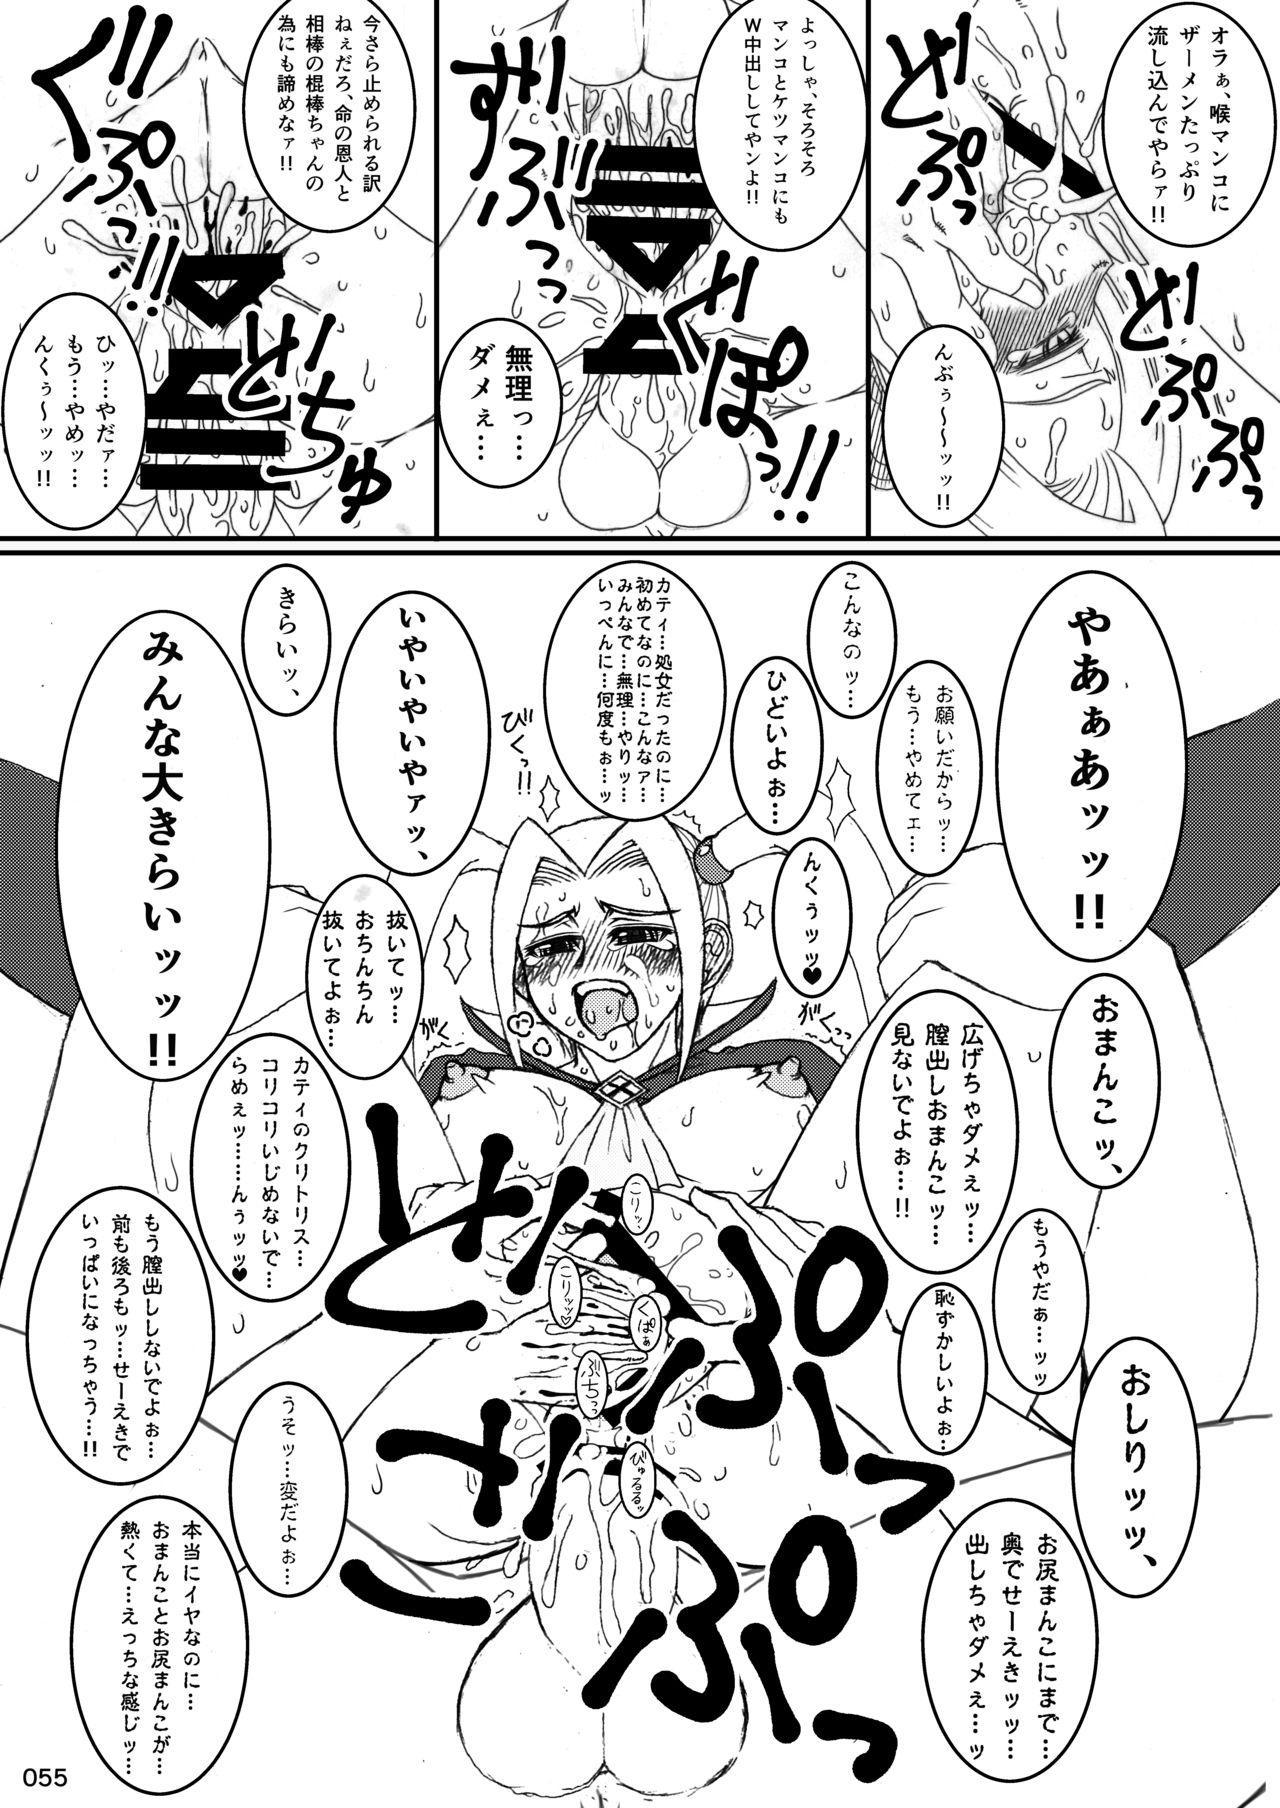 Akatsuki Blitzkampf & EN-1 Perfekt Welt Gangbang Anthology 54